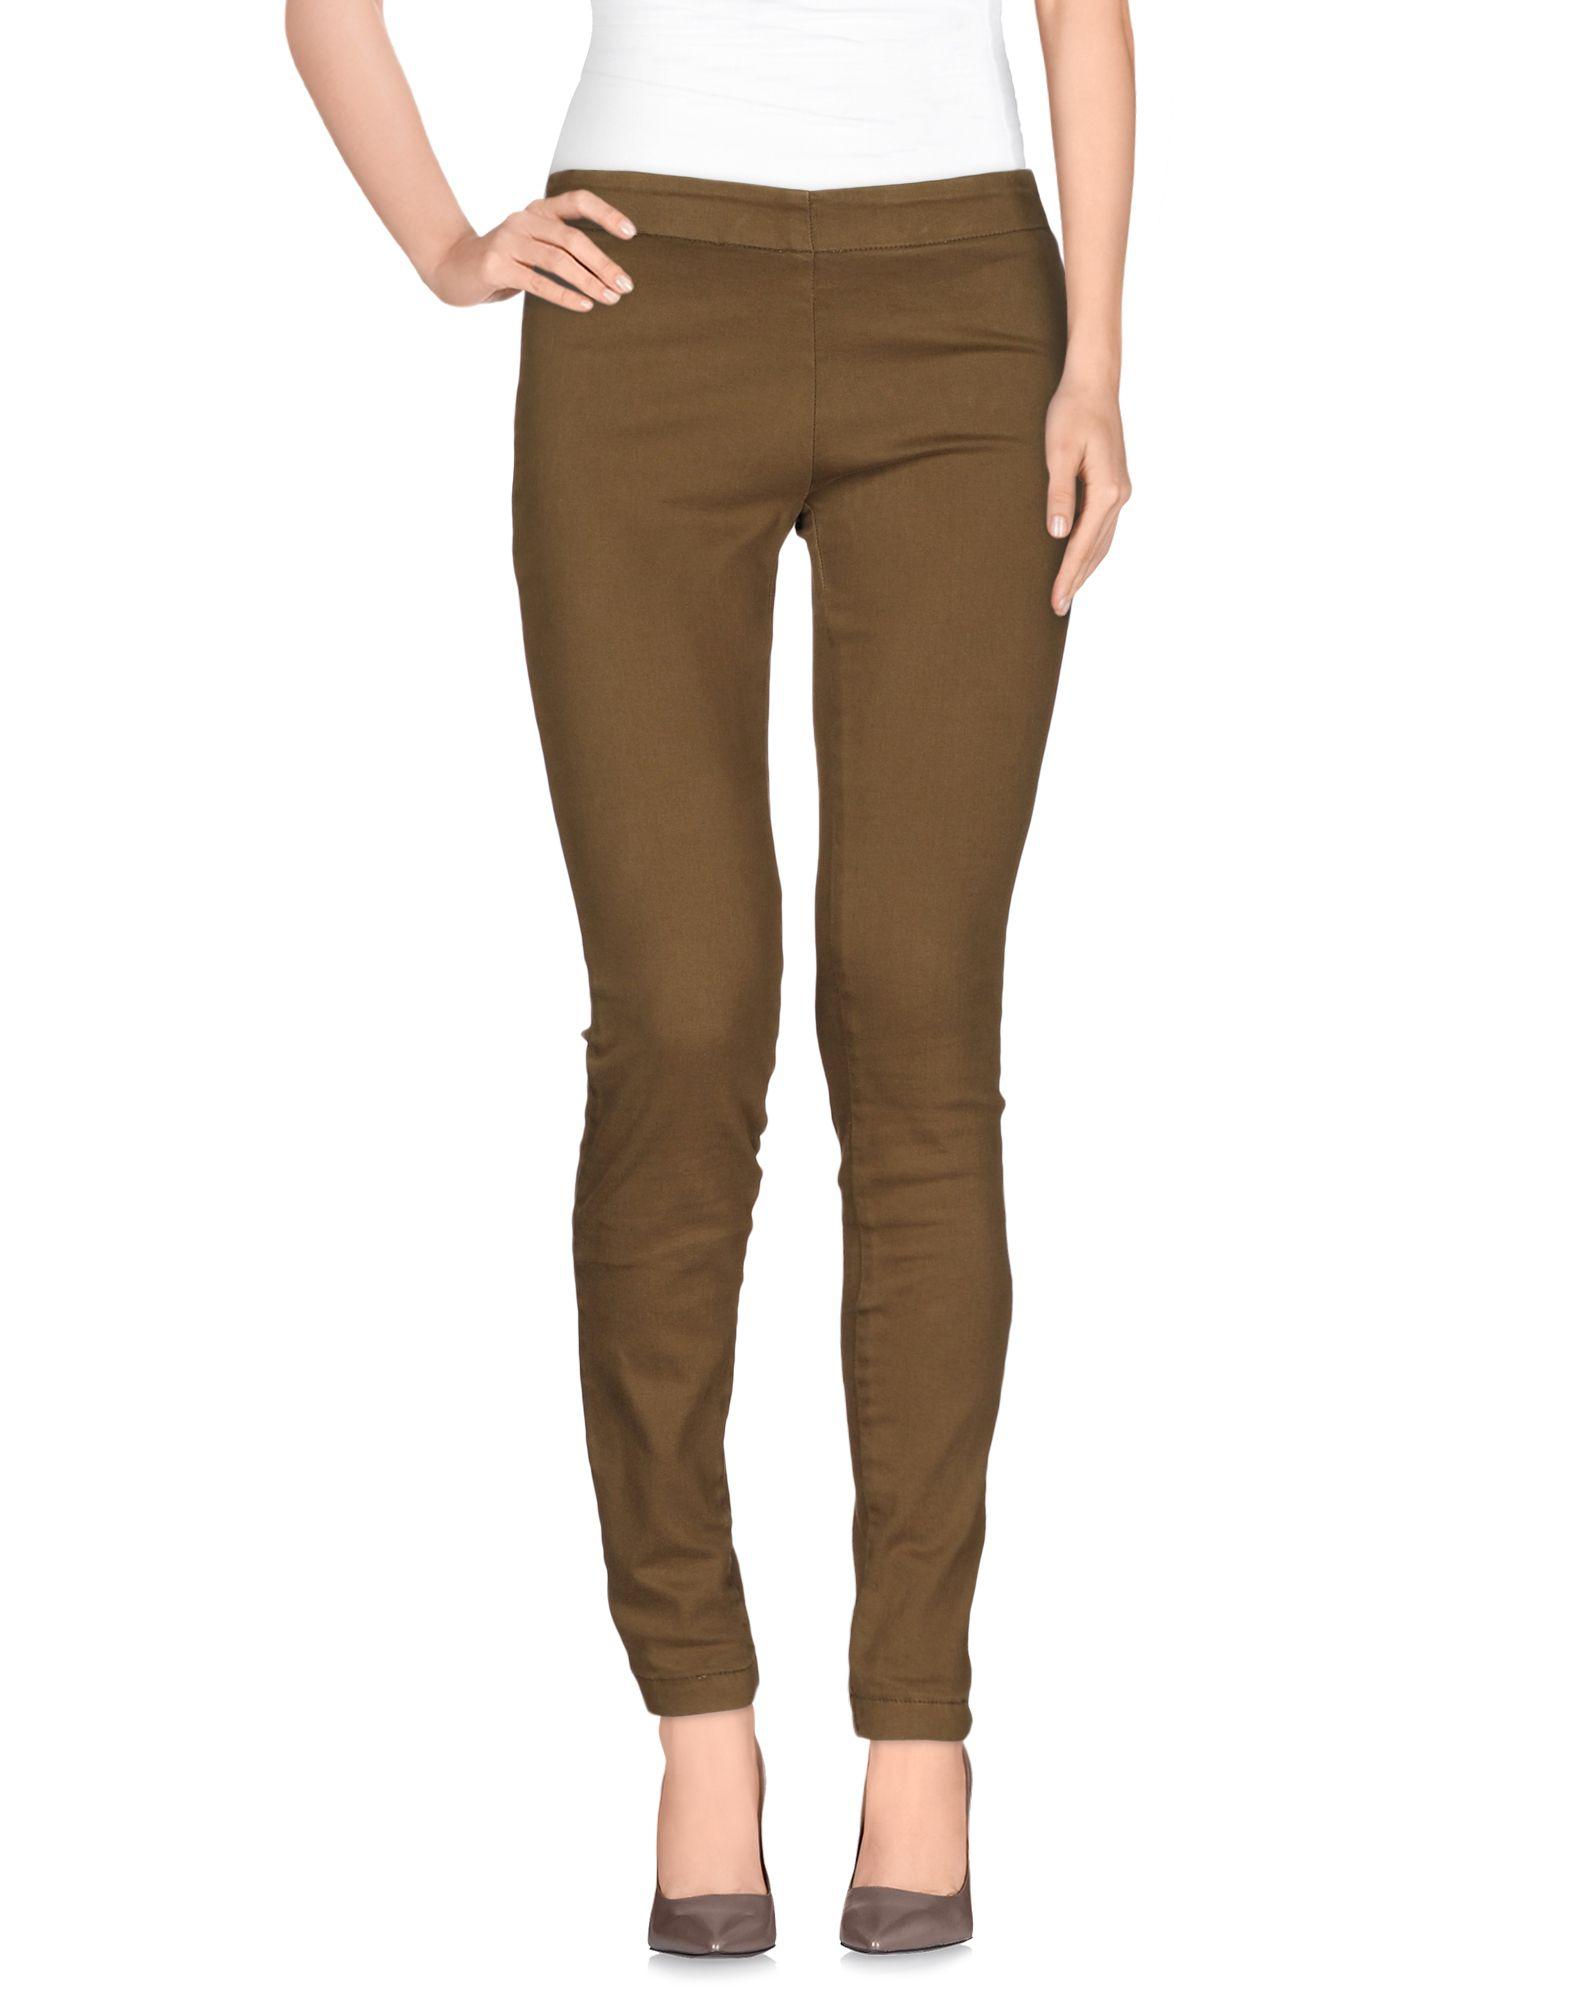 Elegant Cropped Pants For Women Jeans Print Capri Amp More Nordstrom